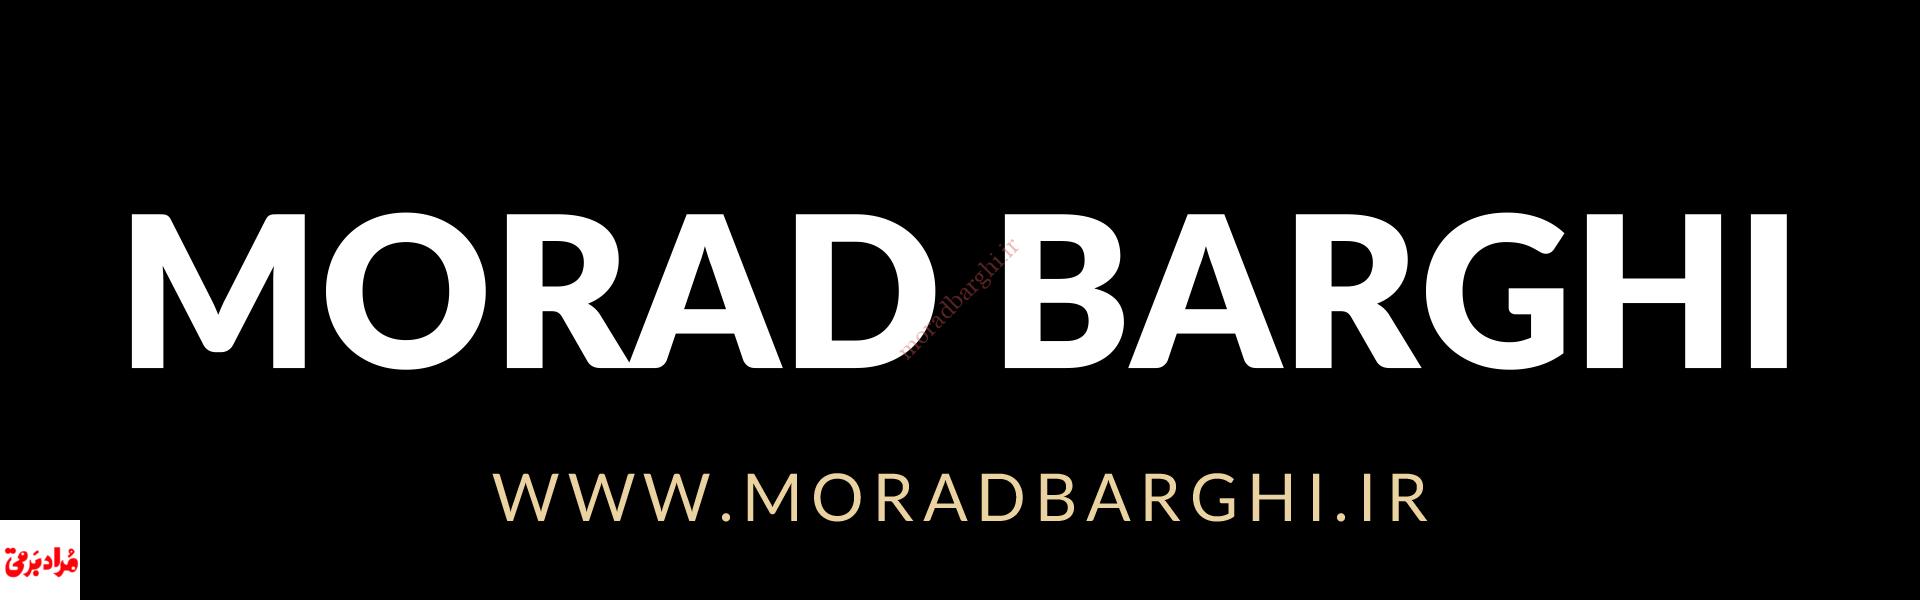 MORADBARGHI